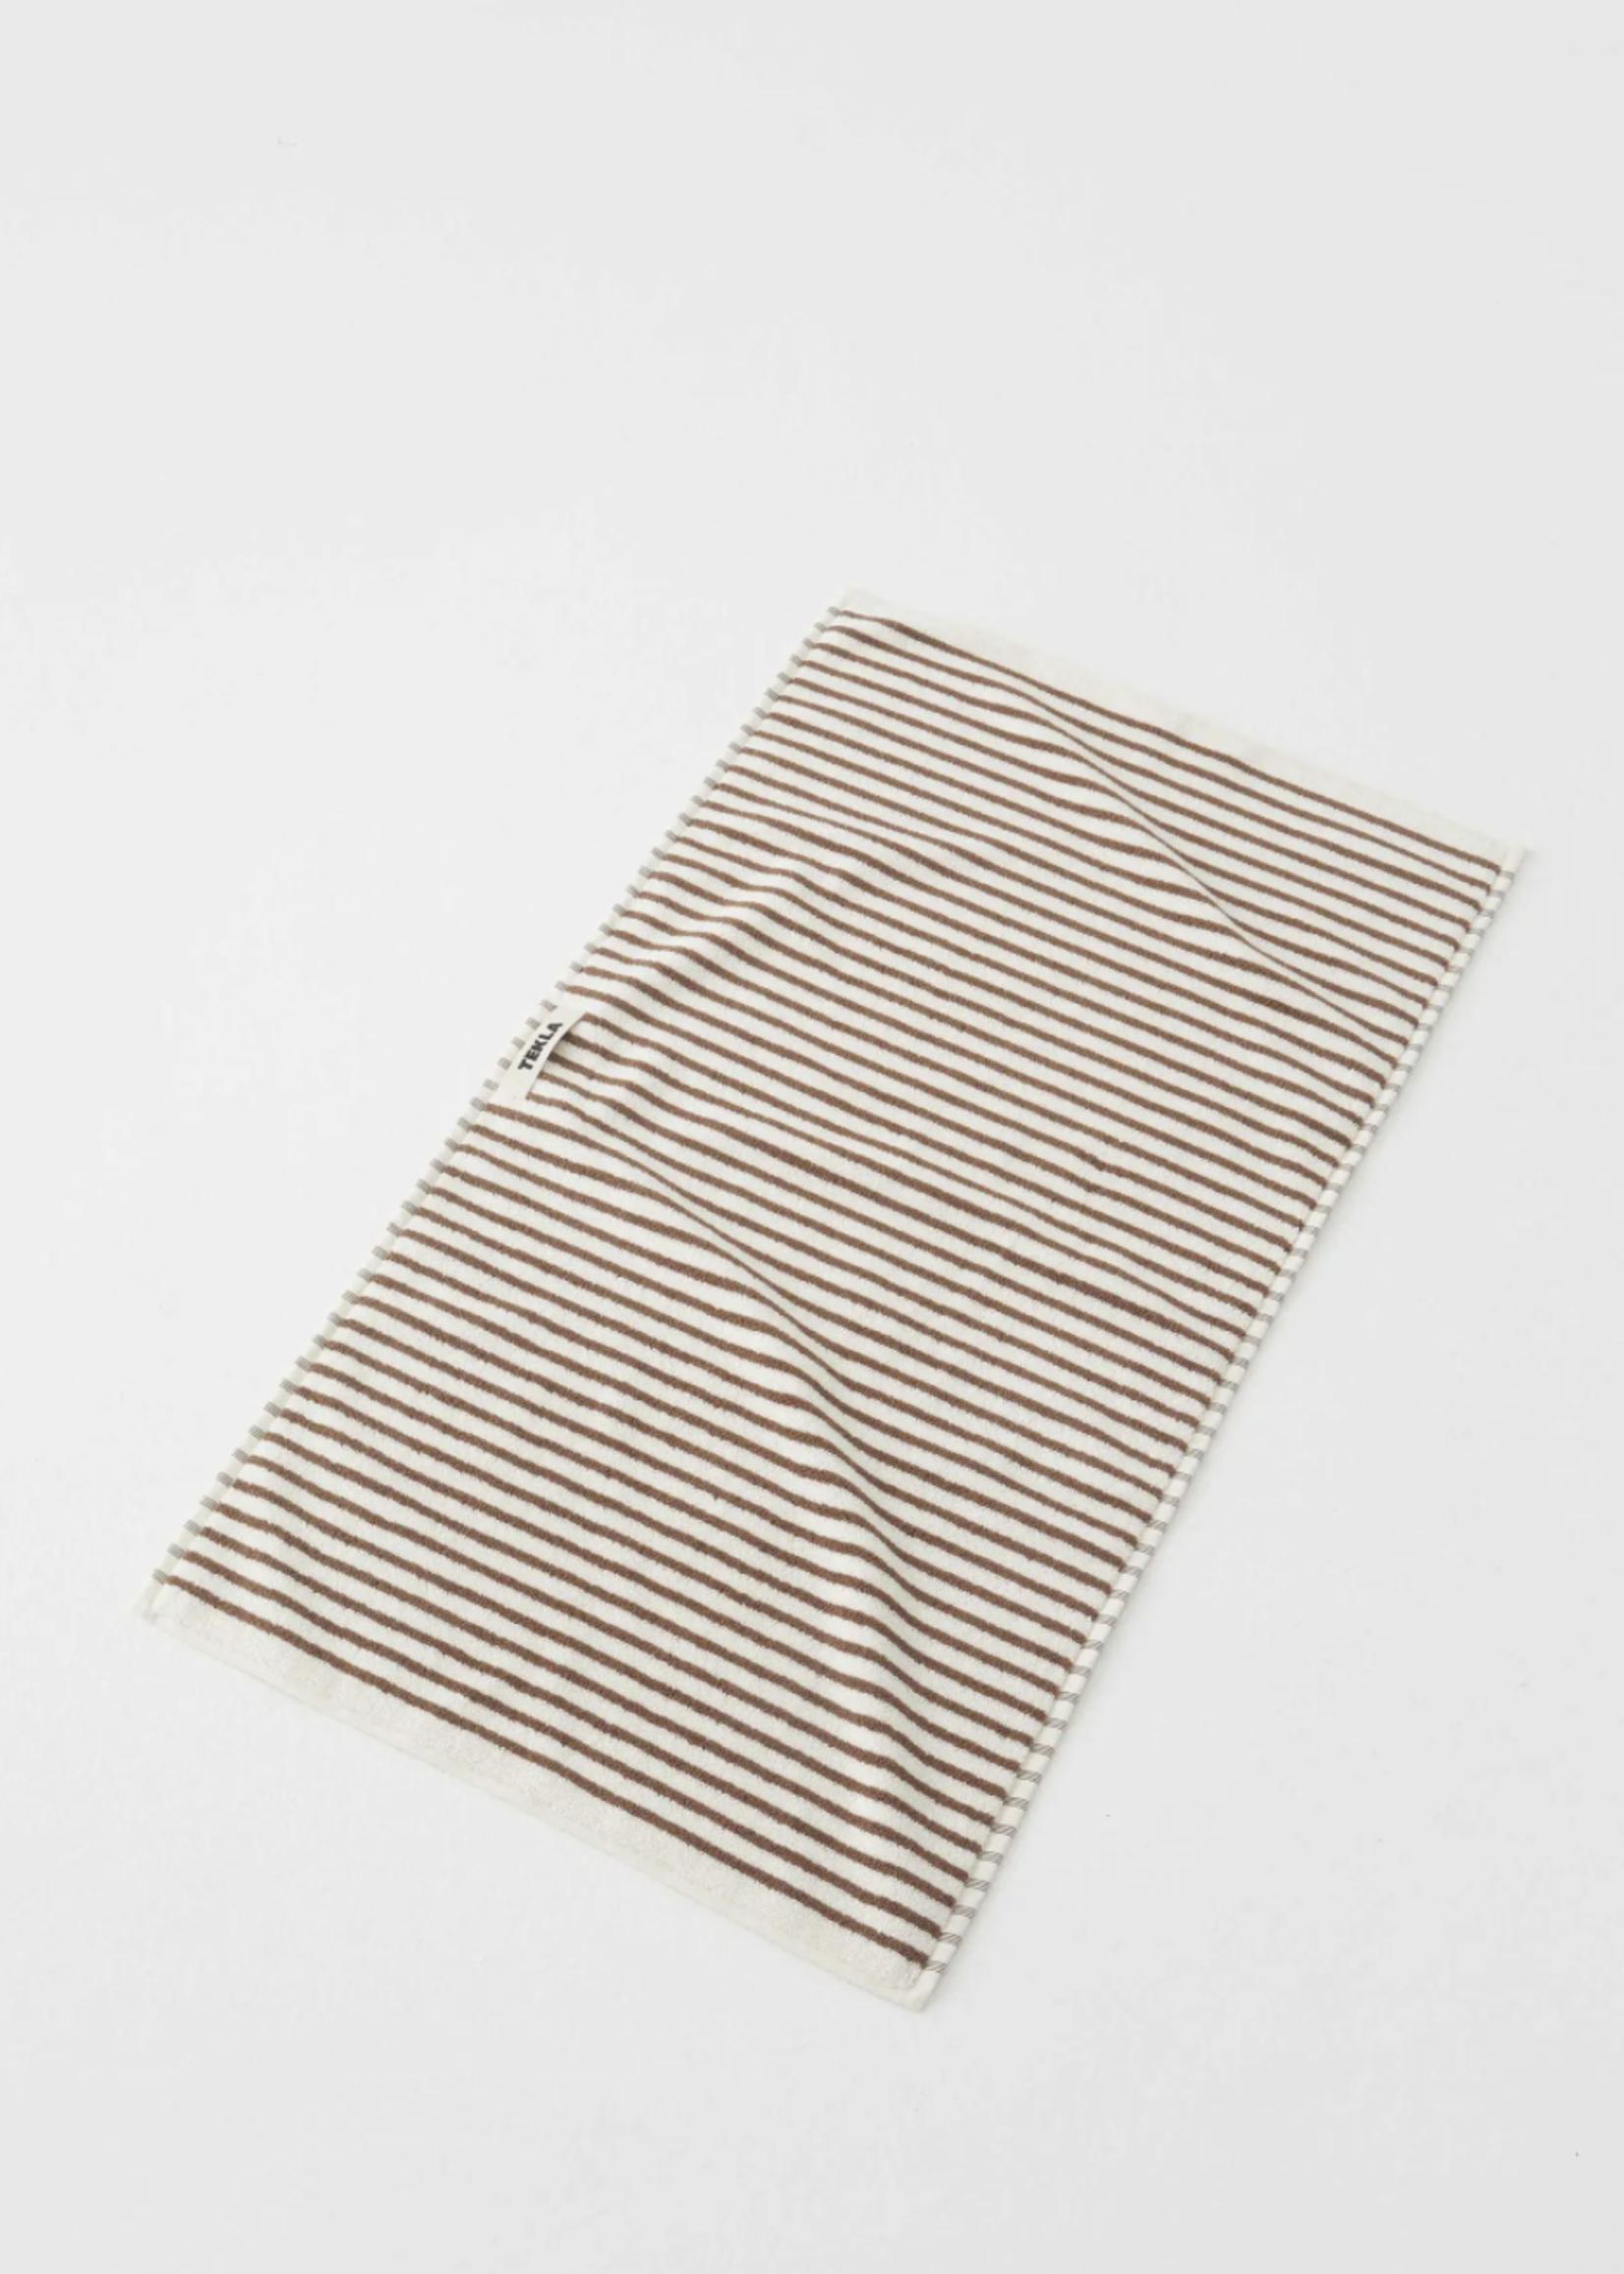 TEKLA Organic Hand Towel in Brown Stripe